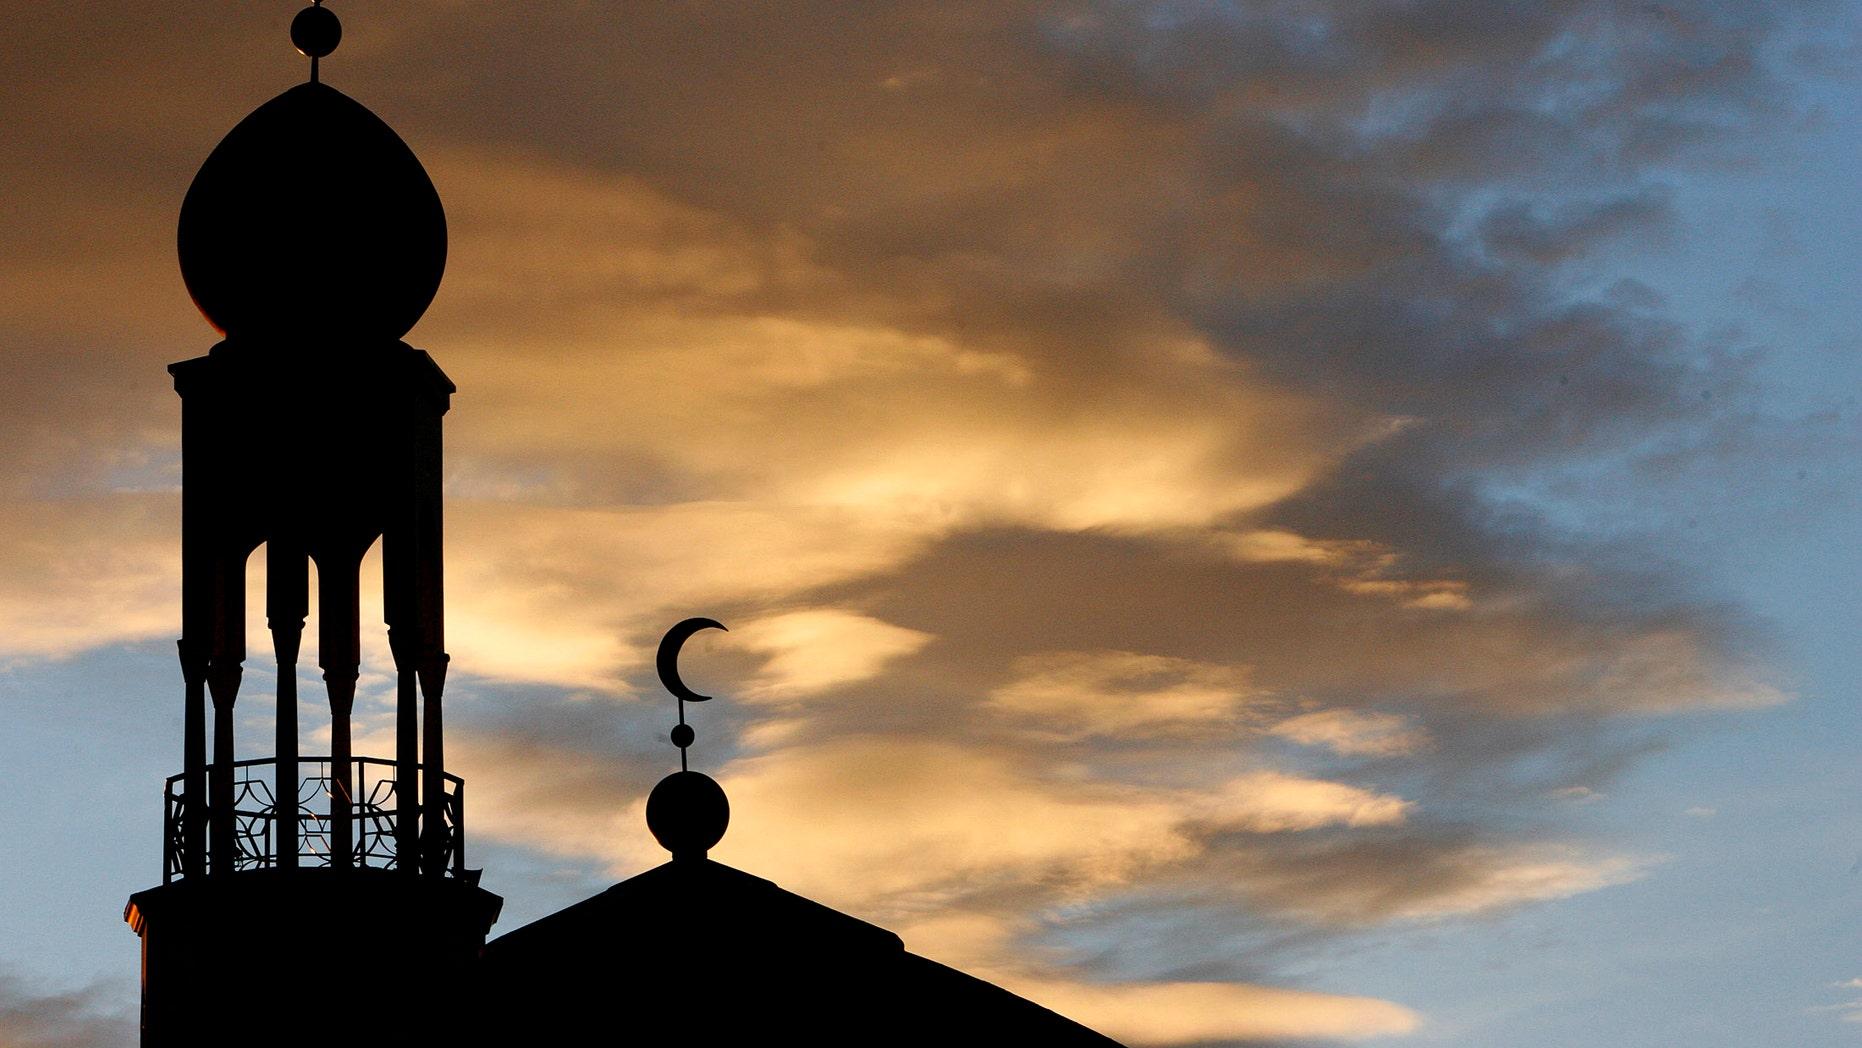 Birmingham Central Mosque, Highgate, Birmingham, England.